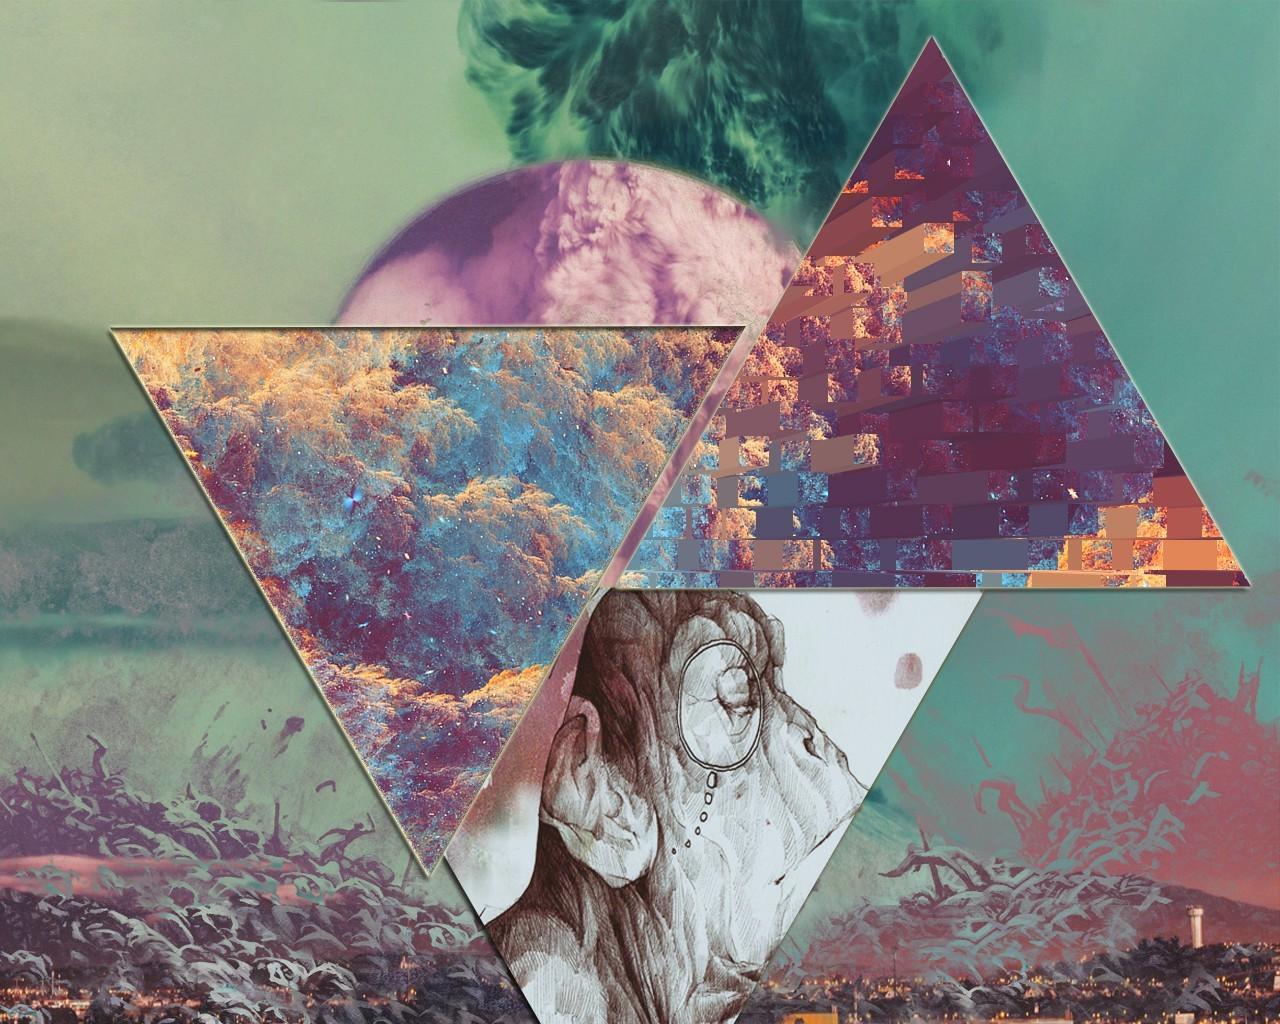 Good Wallpaper Mountain Triangle - 1280x1024_px_Colorful_dust_Earth_monkeys_mountain_People_smoking-629402  Snapshot_839138.jpg!d